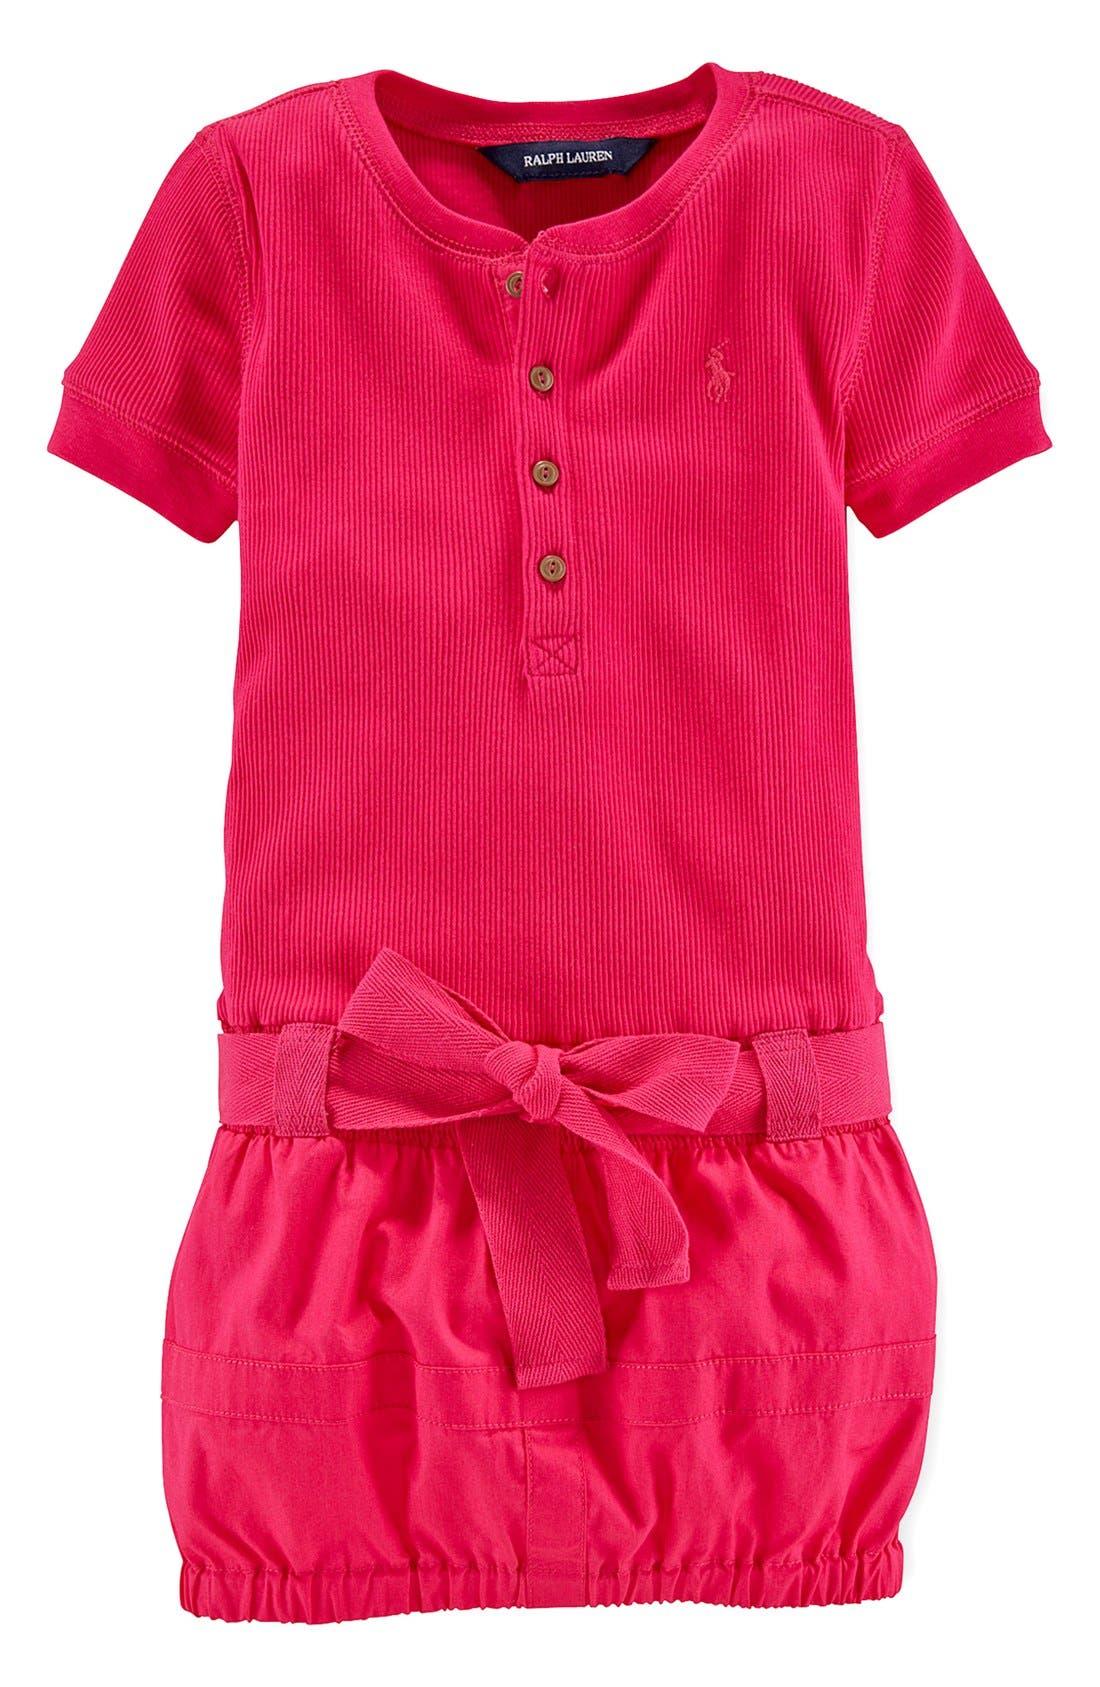 Main Image - Ralph Lauren Cotton Cargo Dress (Toddler Girls)